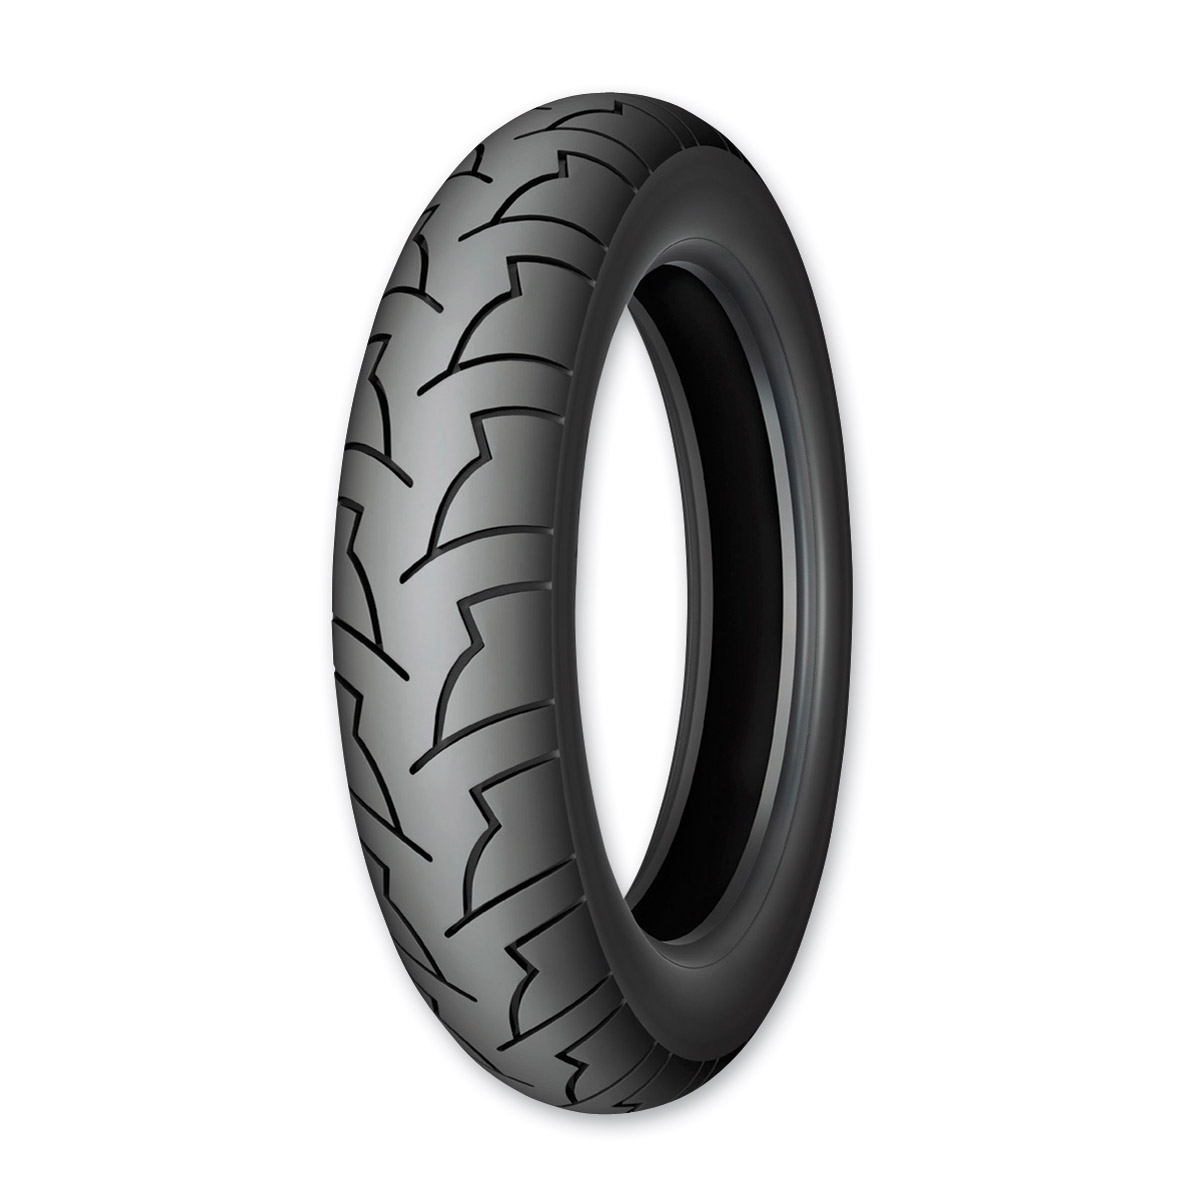 Michelin Pilot Activ 4.00H-18 Rear Tire